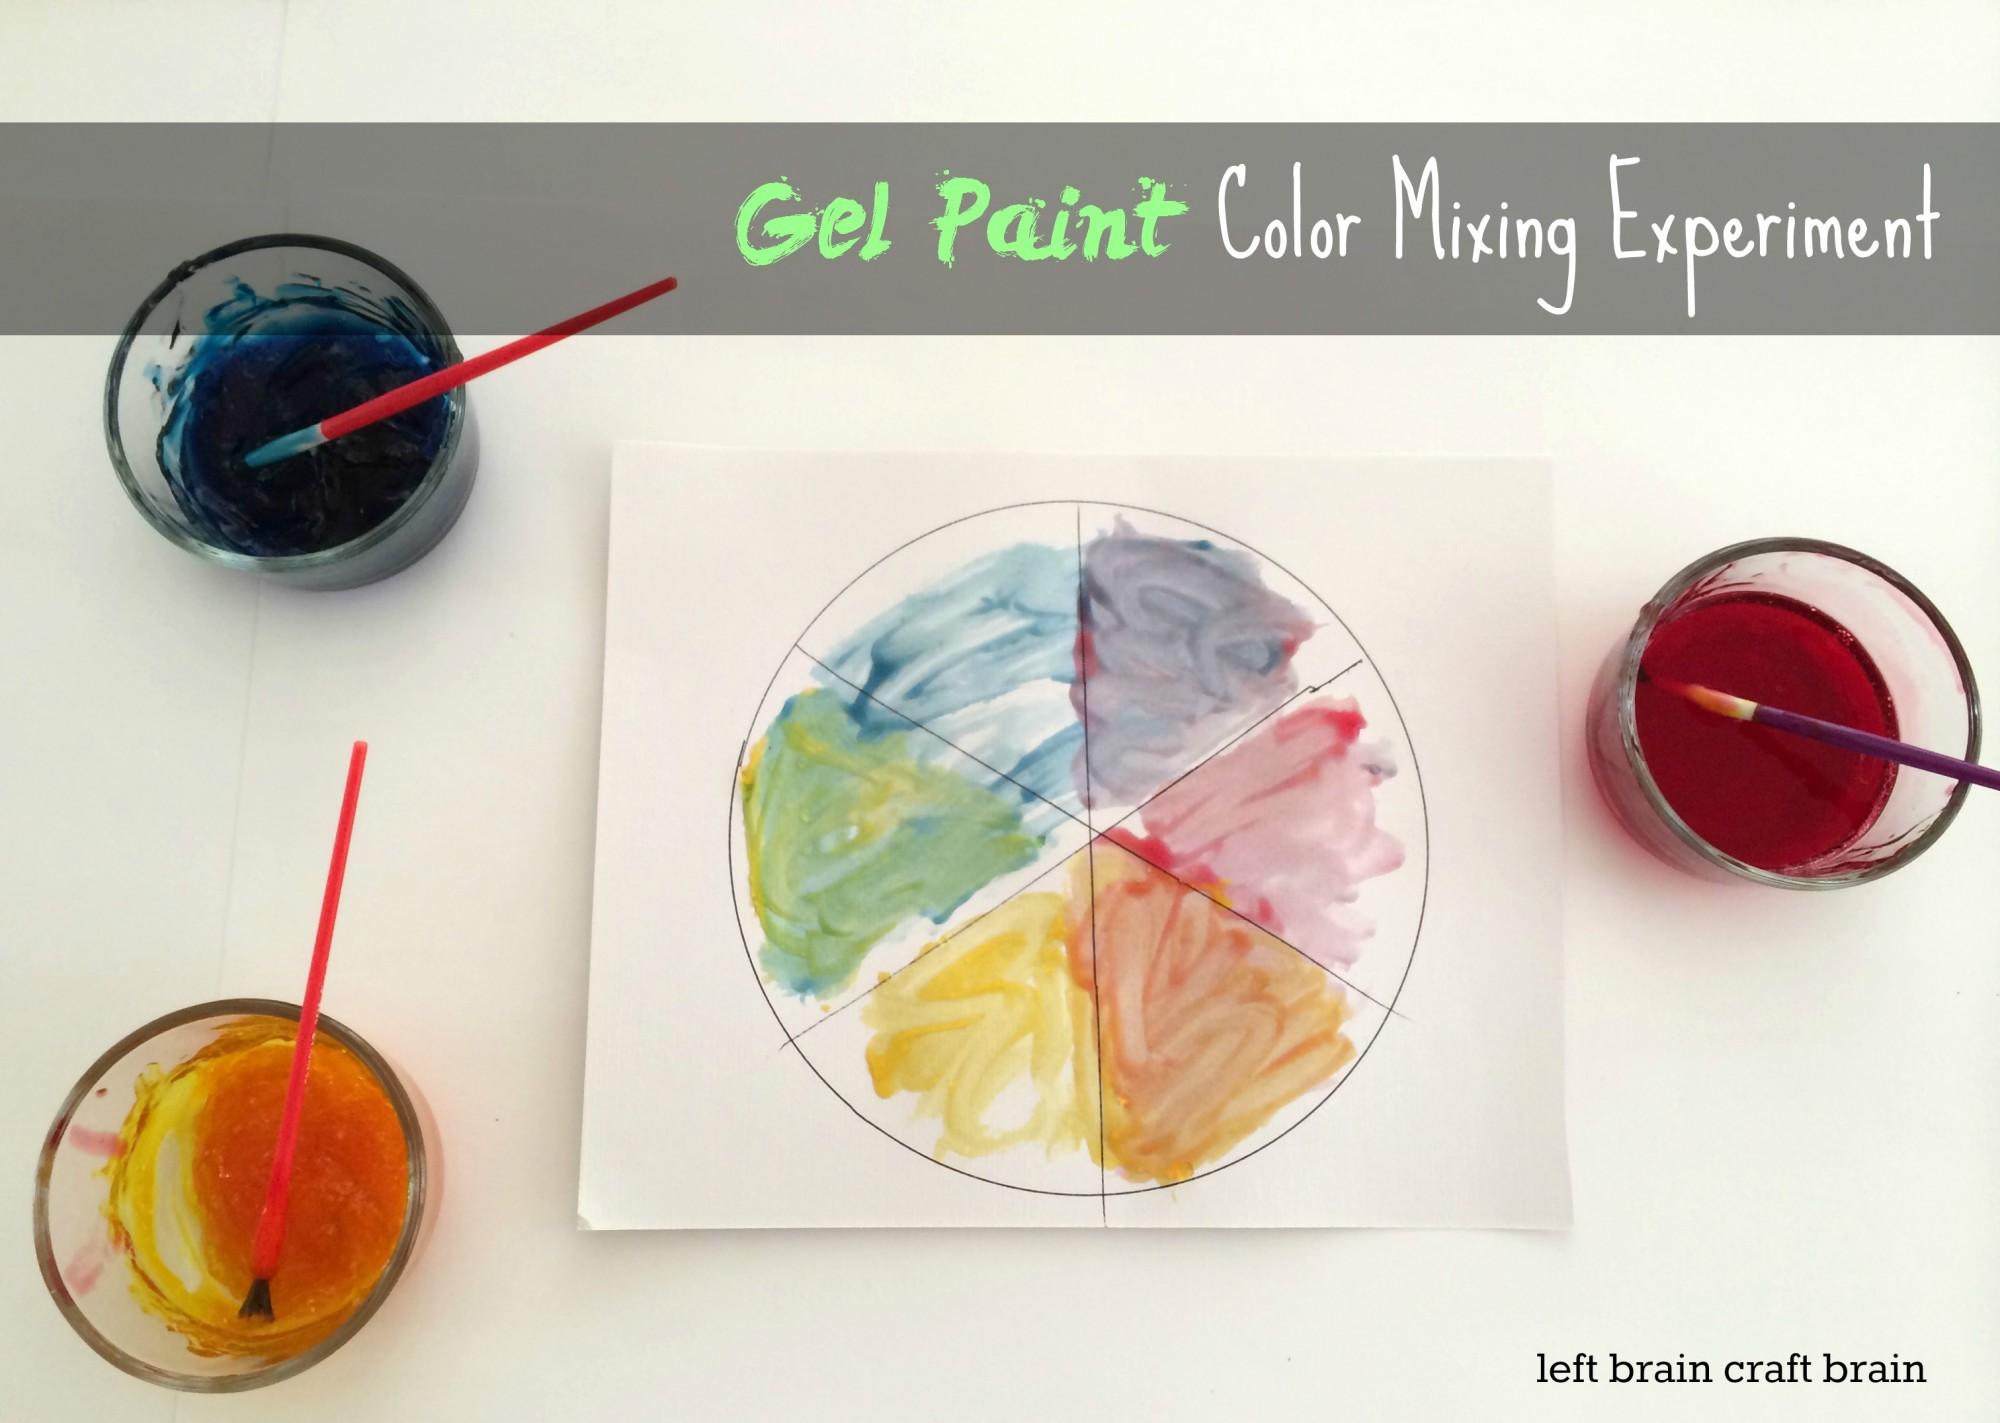 gel-paint-color-mixing-experiment-left-brain-craft-brain